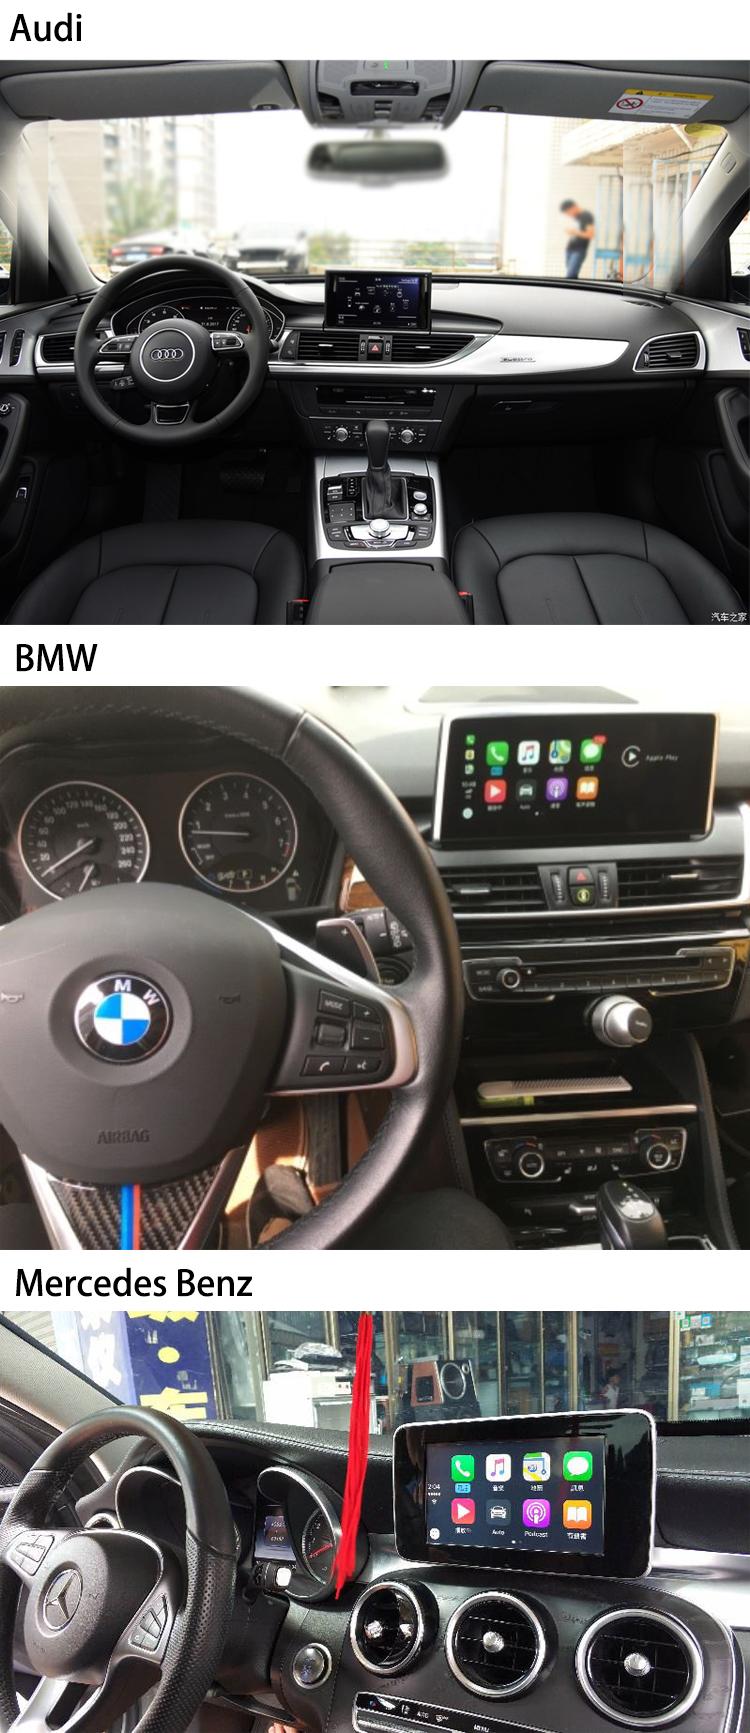 Carlinkit Apple Wireless Carplay Mirror Link Interface For Audi Mercedes  Benz Bmw - Buy Carplay Interface For Audi,Carplay Wireless,Carplay For Audi